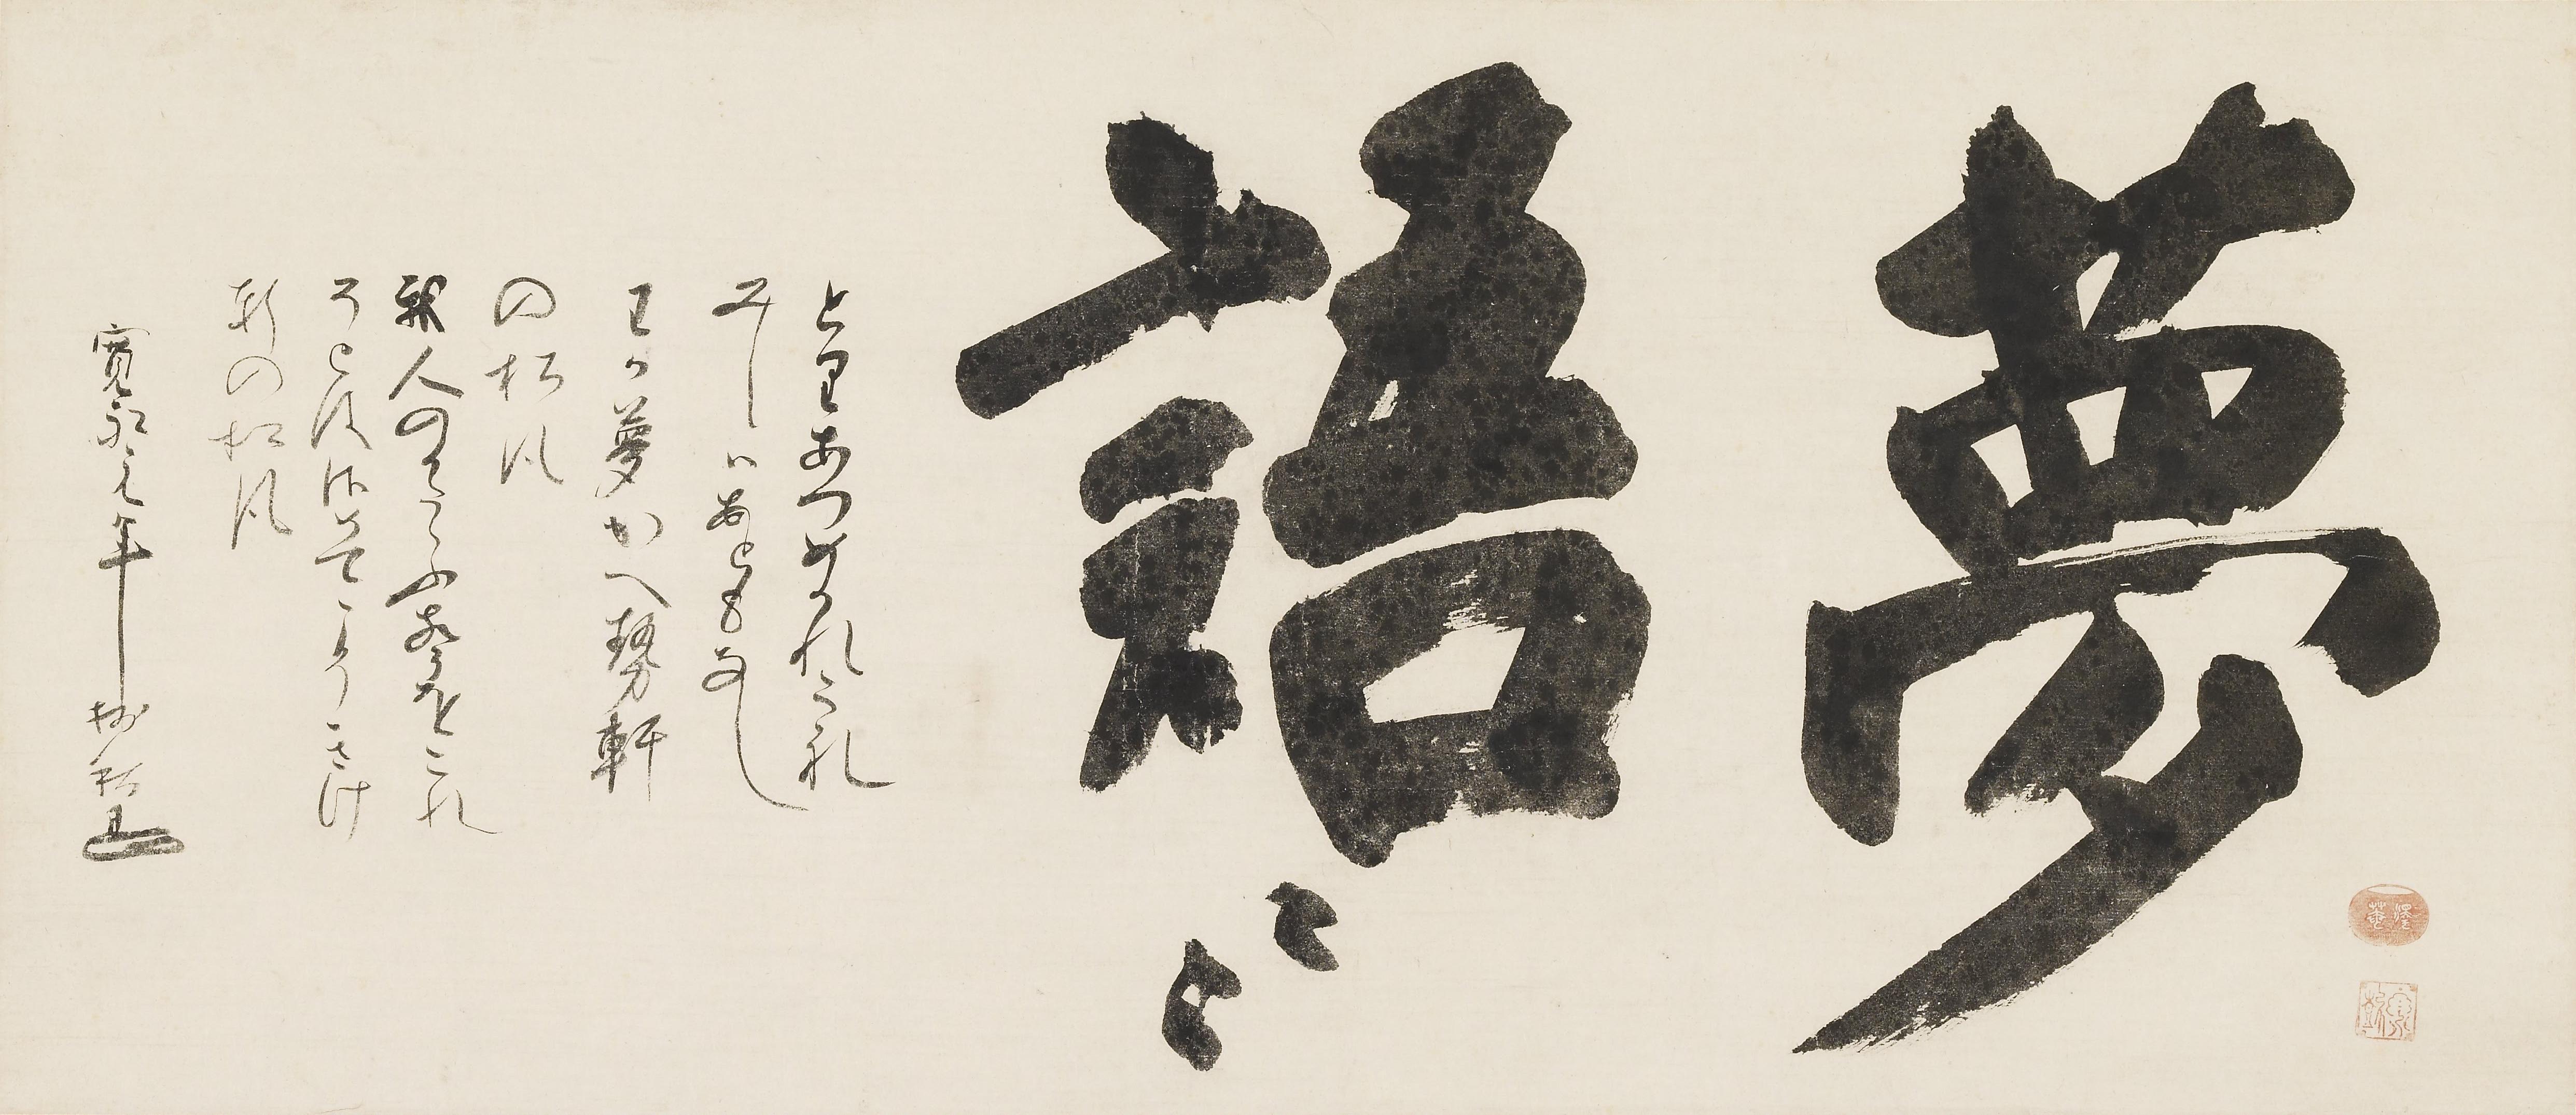 https://upload.wikimedia.org/wikipedia/commons/0/0c/%E5%A4%A2%E8%AA%9E_by_Takuan_Soho_%28Nomura_Art_Museum%29.jpg